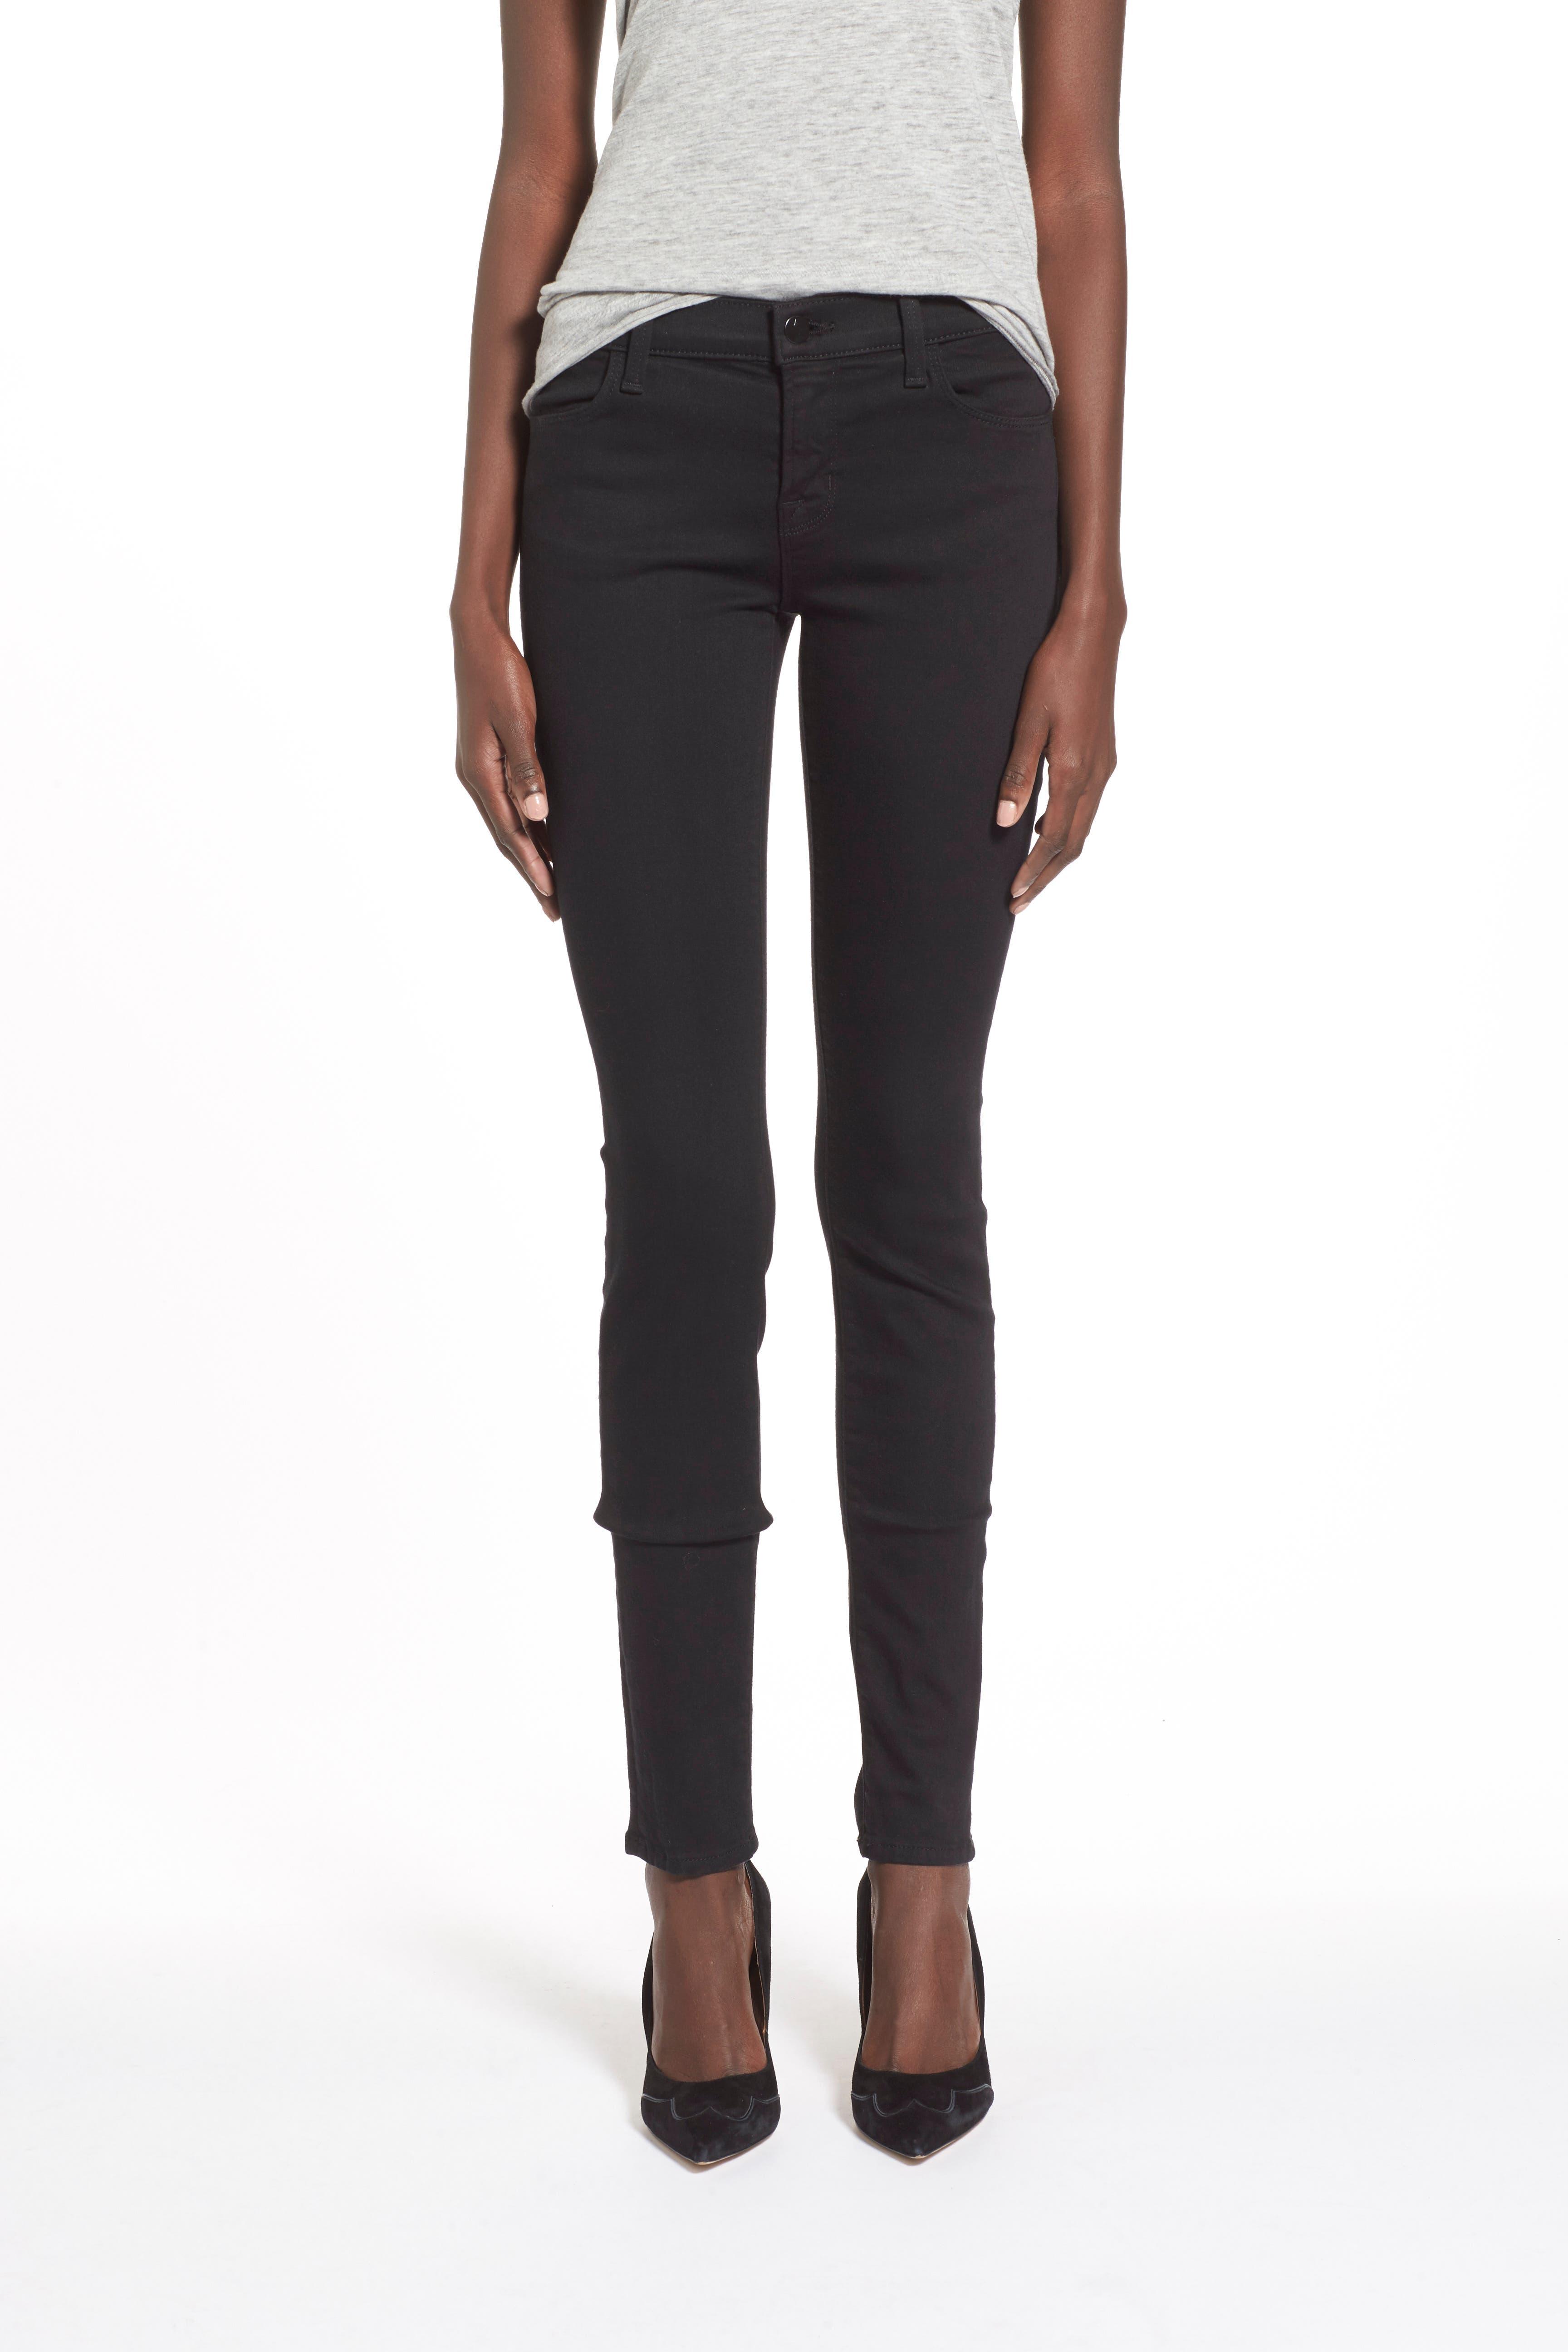 J BRAND,                             Super Skinny Jeans,                             Alternate thumbnail 8, color,                             SERIOUSLY BLACK